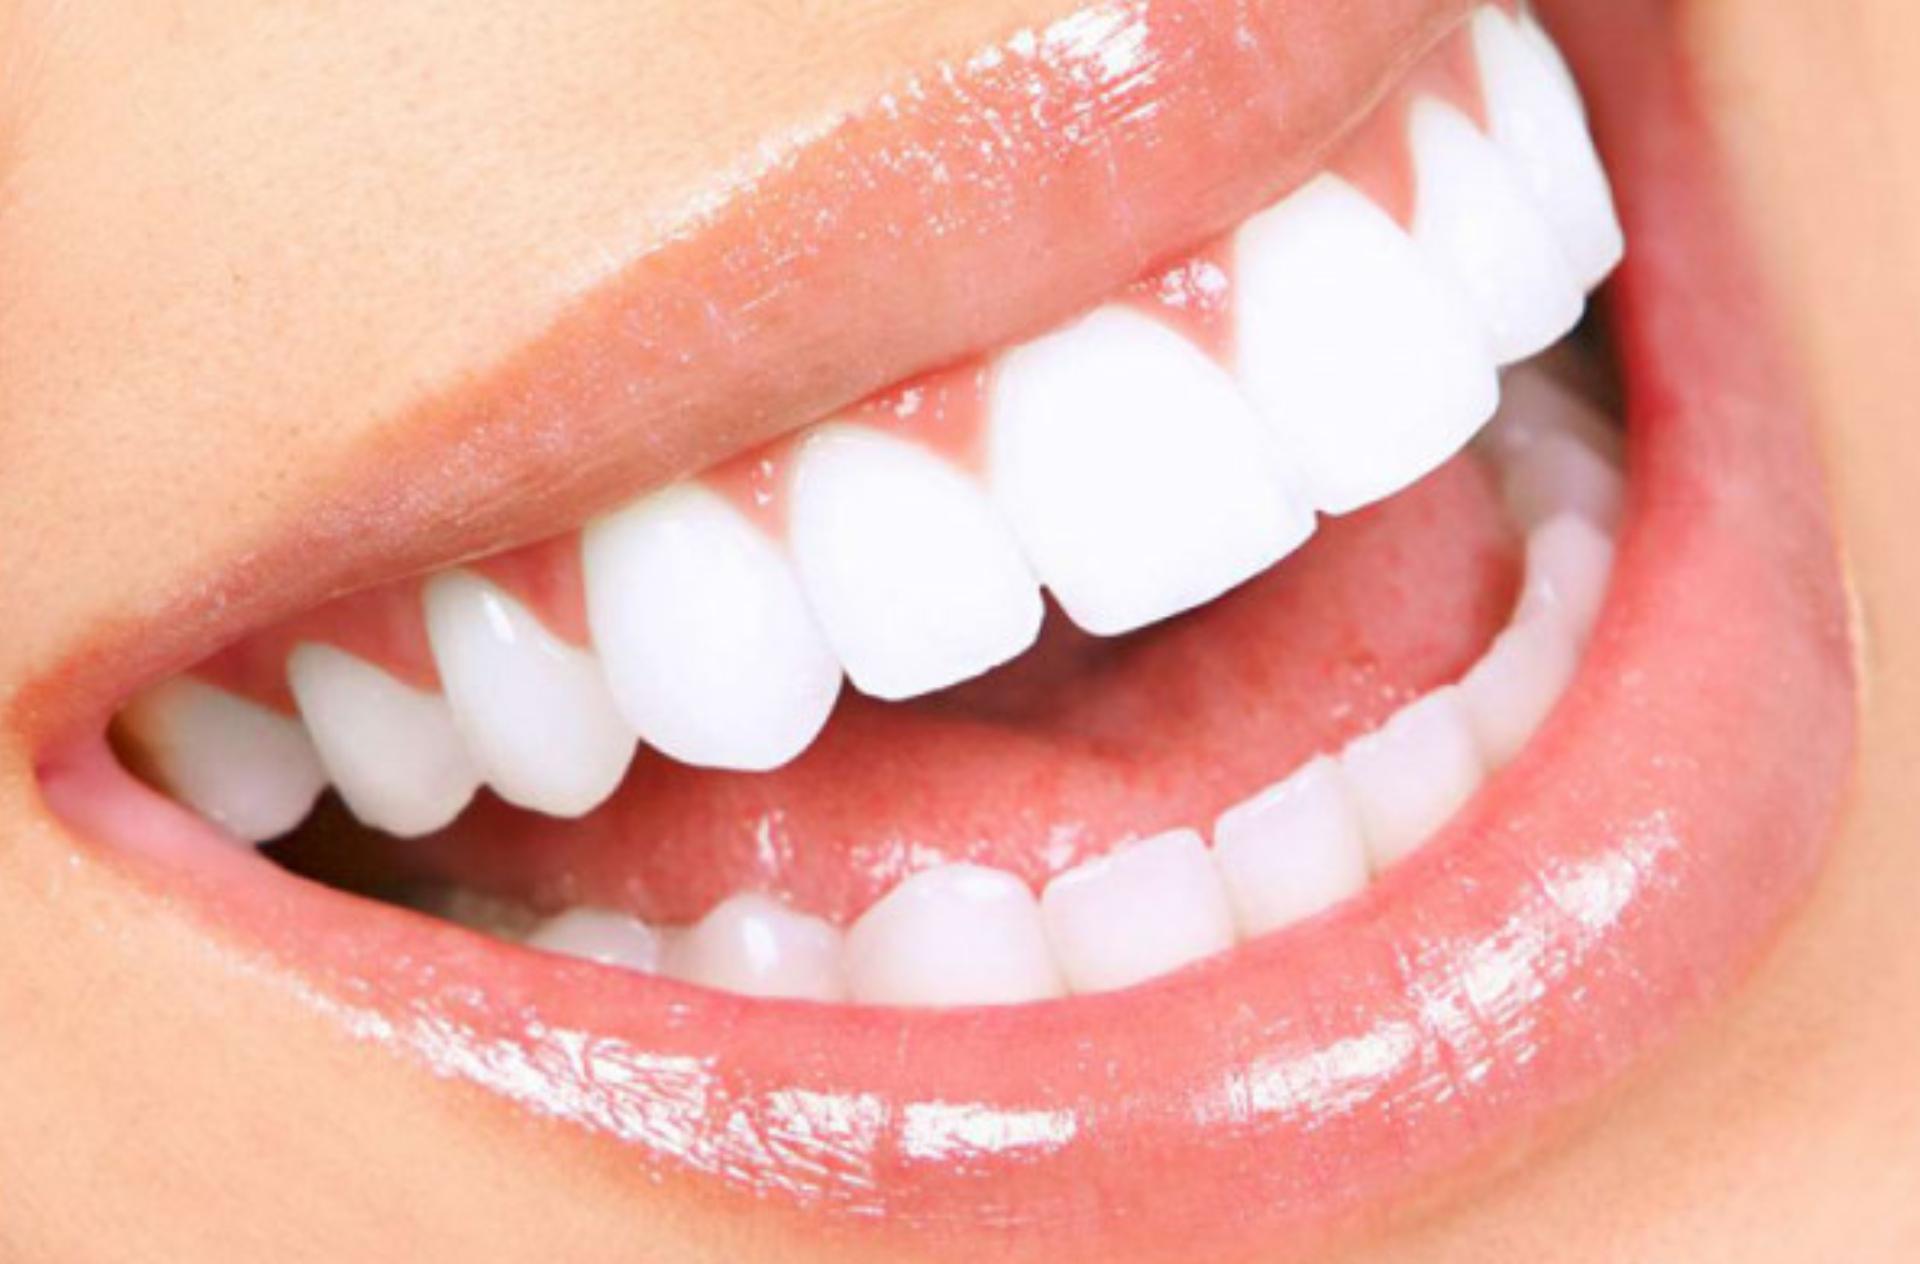 Da Vincis smile reconstruction protocol by Apostoloski